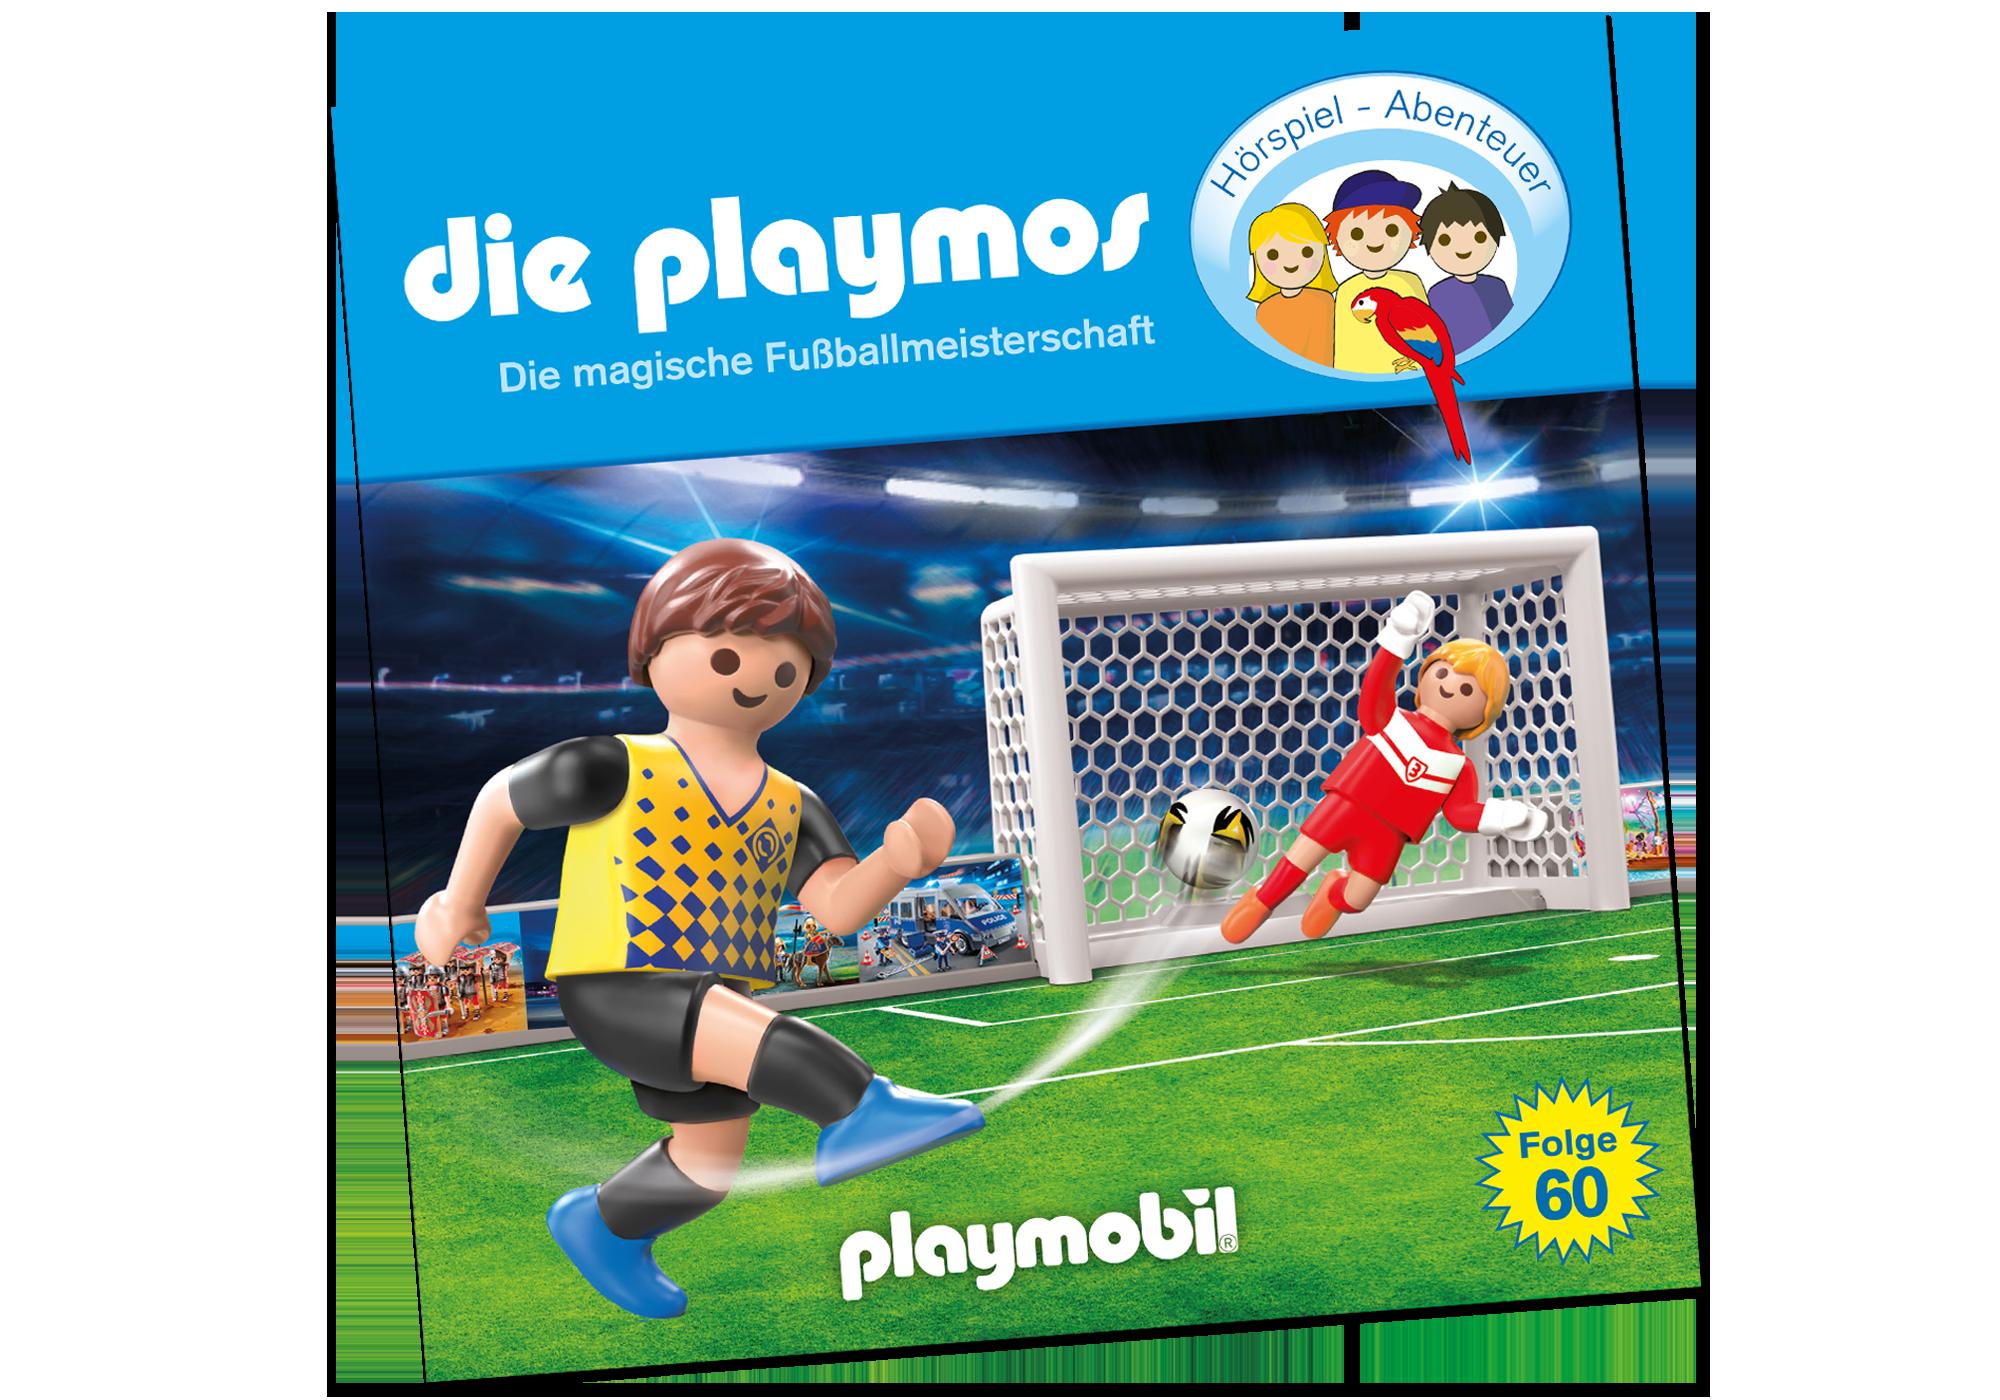 http://media.playmobil.com/i/playmobil/80063_product_detail